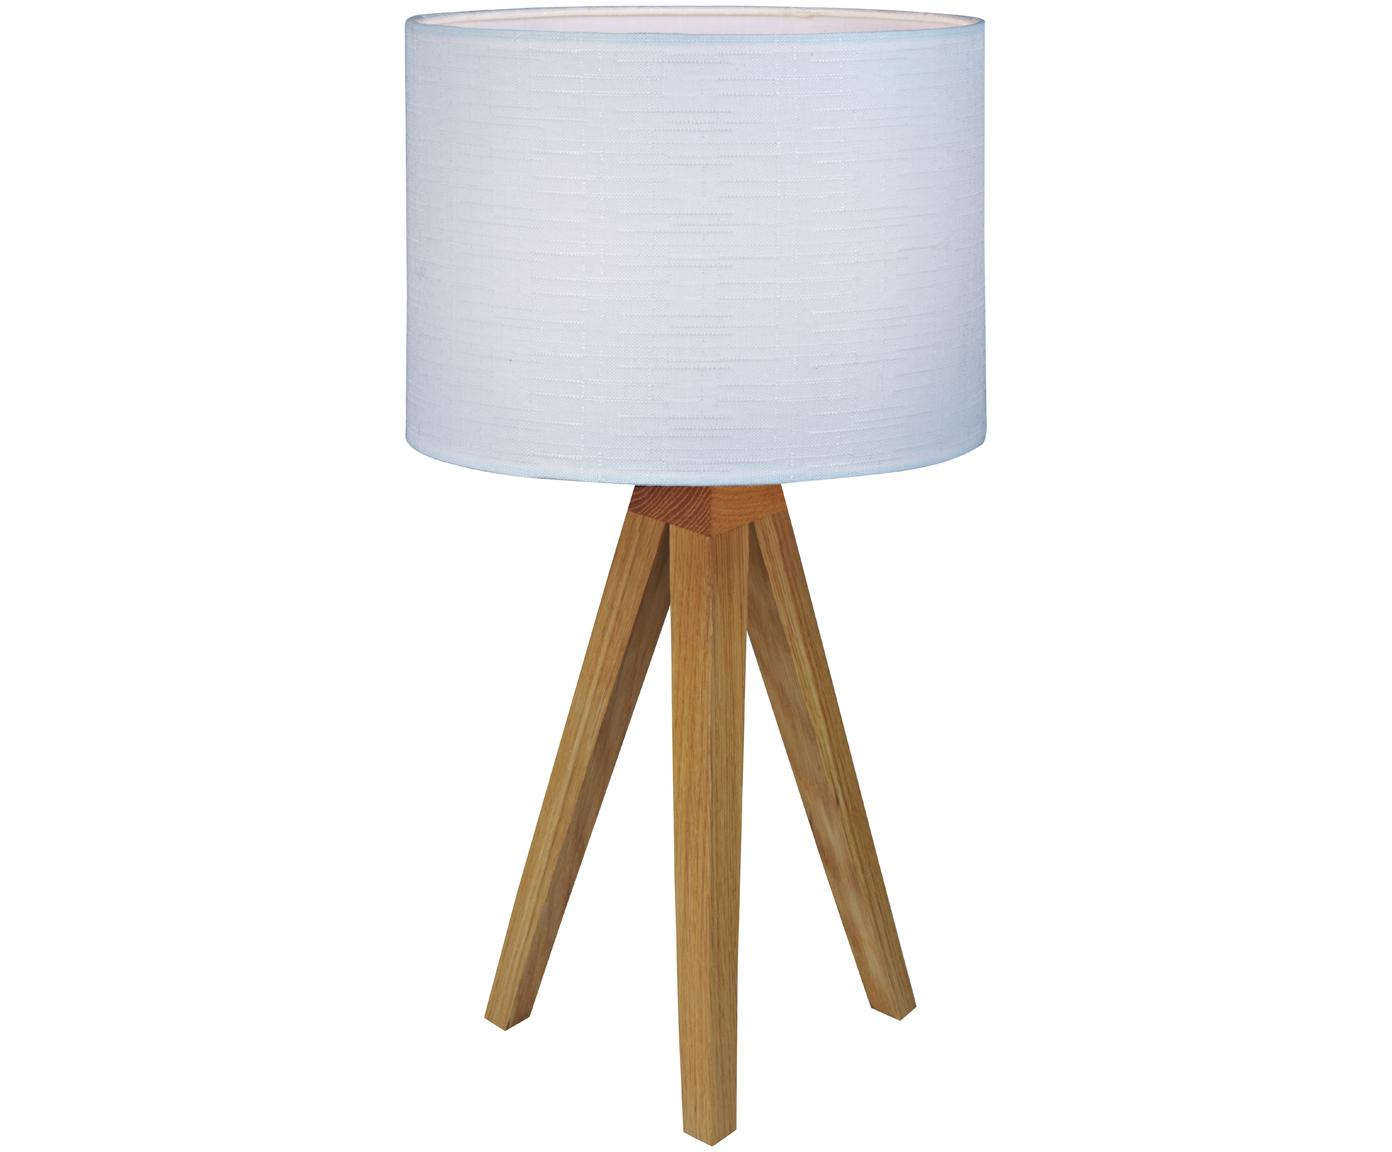 Tafellamp Kullen, Lampvoet: eikenhout, Lampenkap: polyester, Lampvoet: eikenhoutkleurig. Lampenkap: wit, Ø 23 x H 44 cm